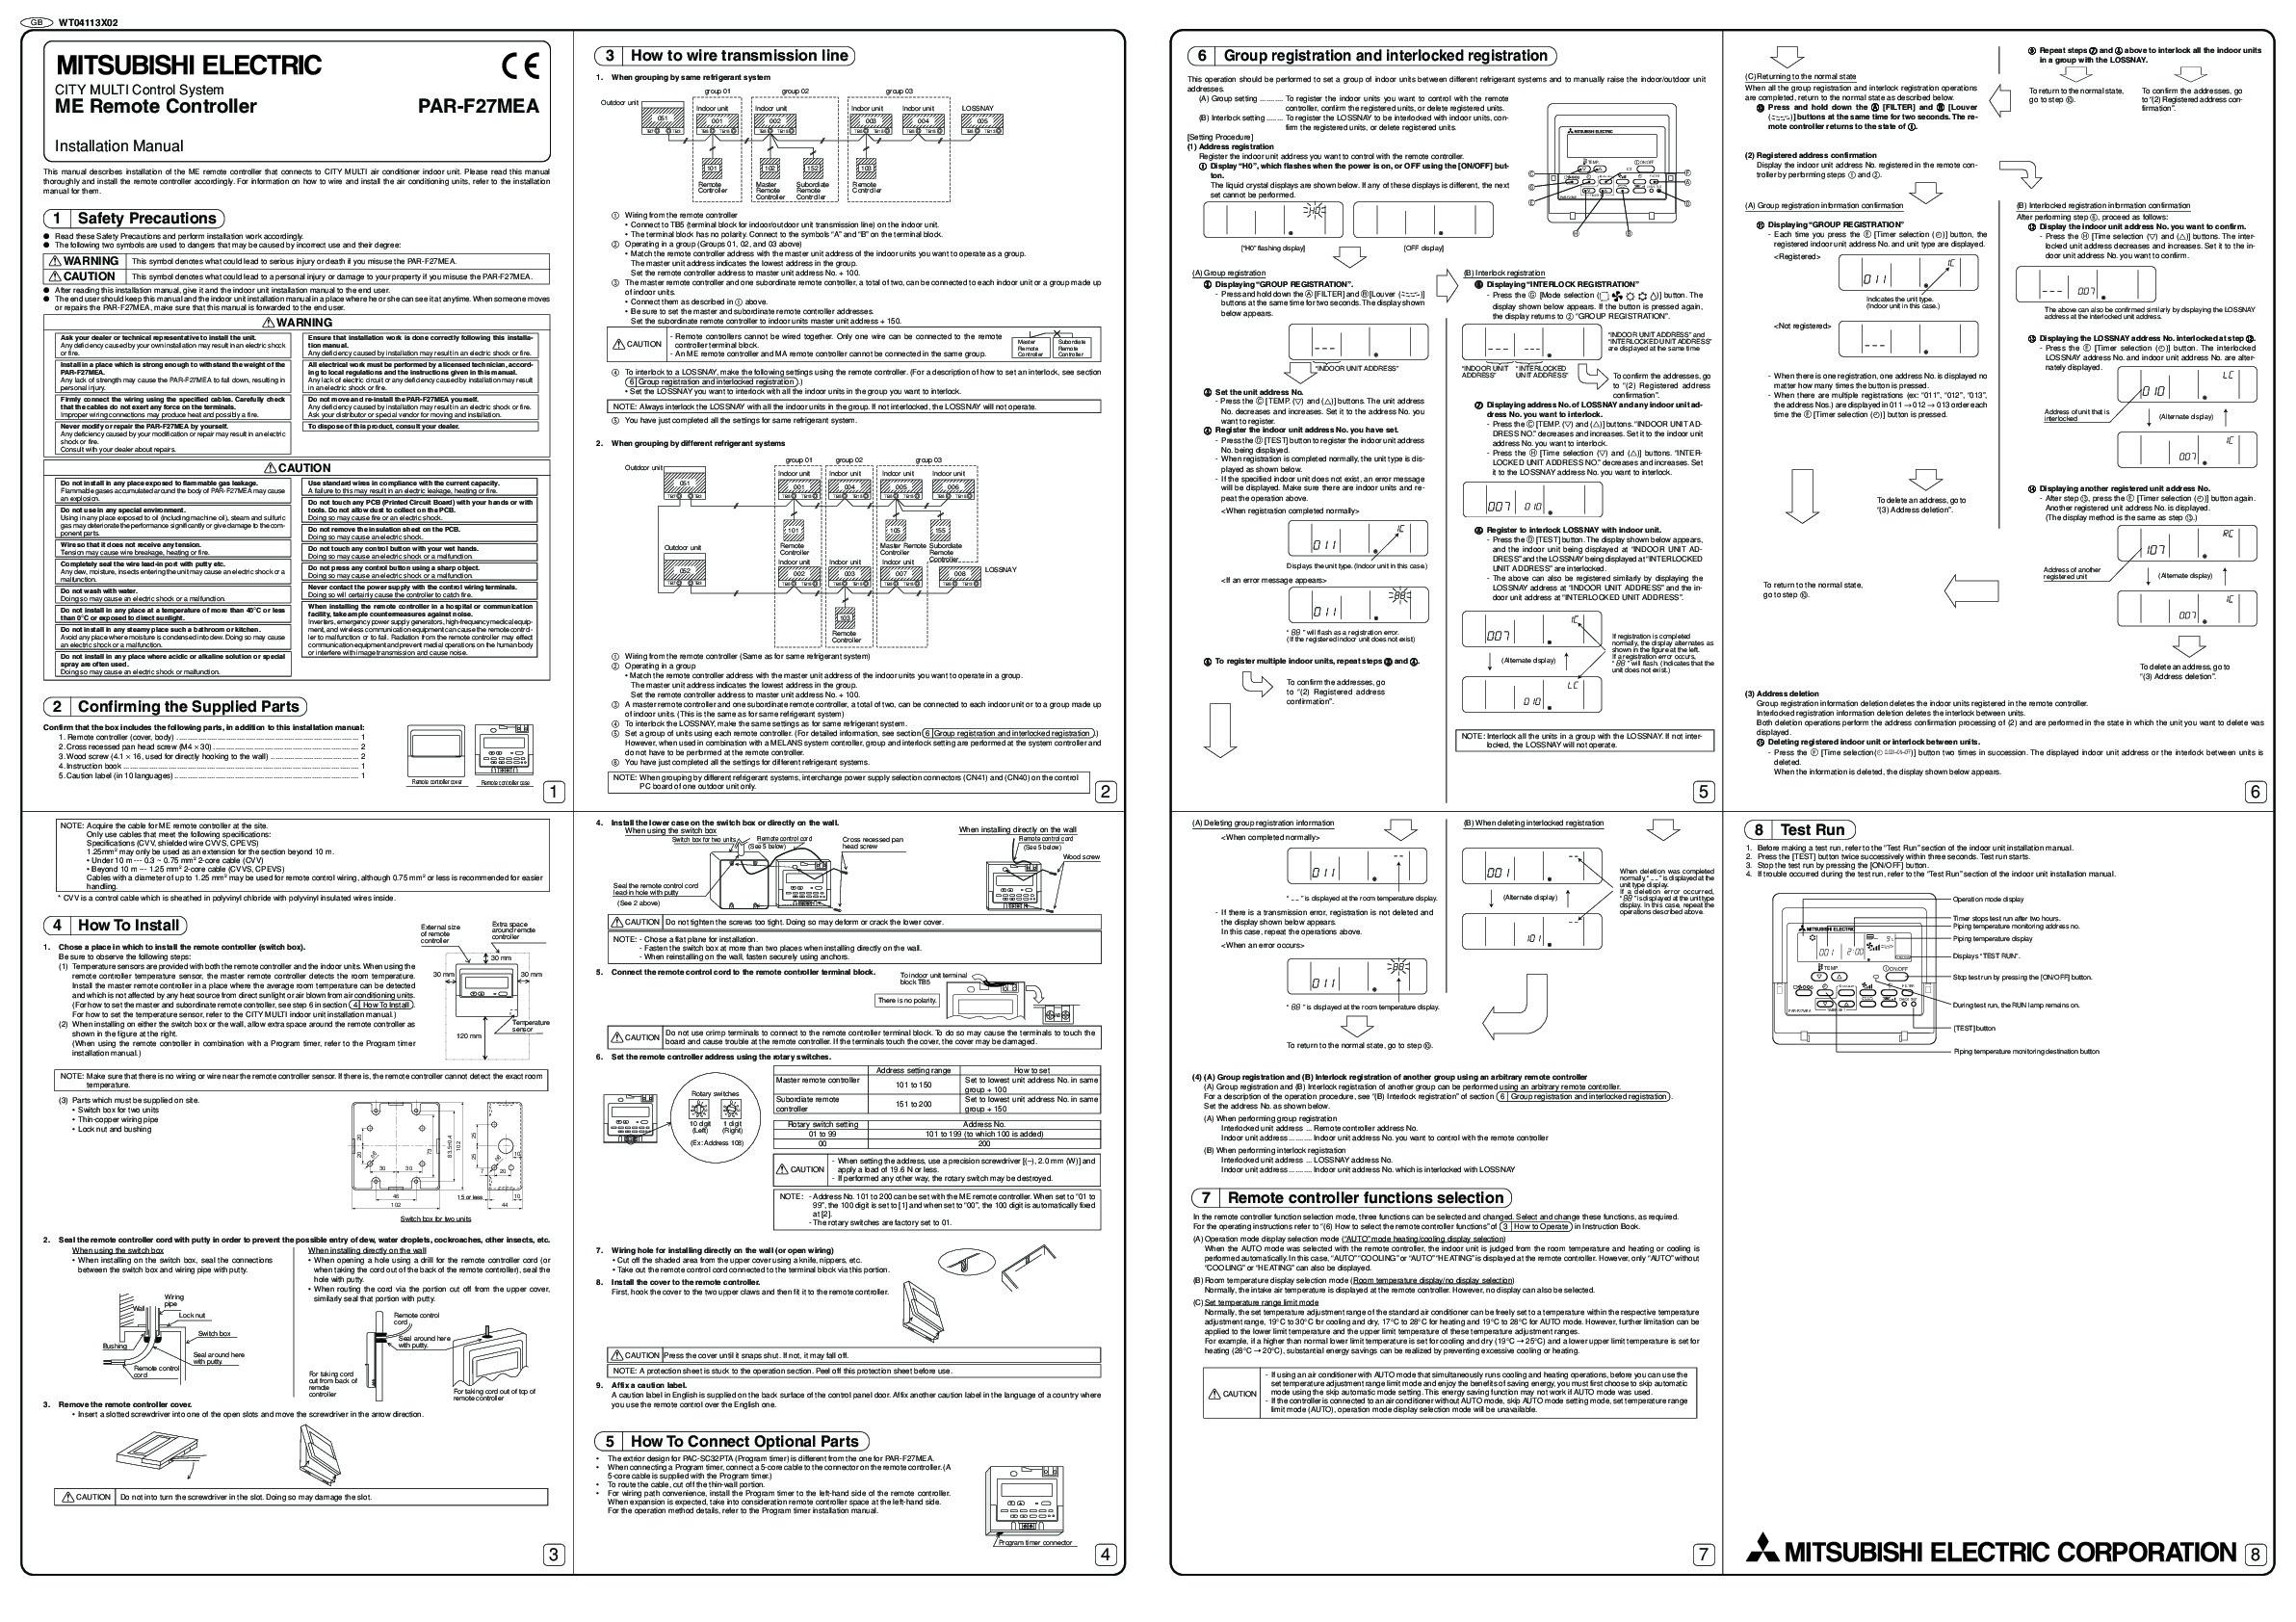 Mitsubishi Mr Slim PAR F27MEA Remote Controller Air Conditioner Installation Instructions